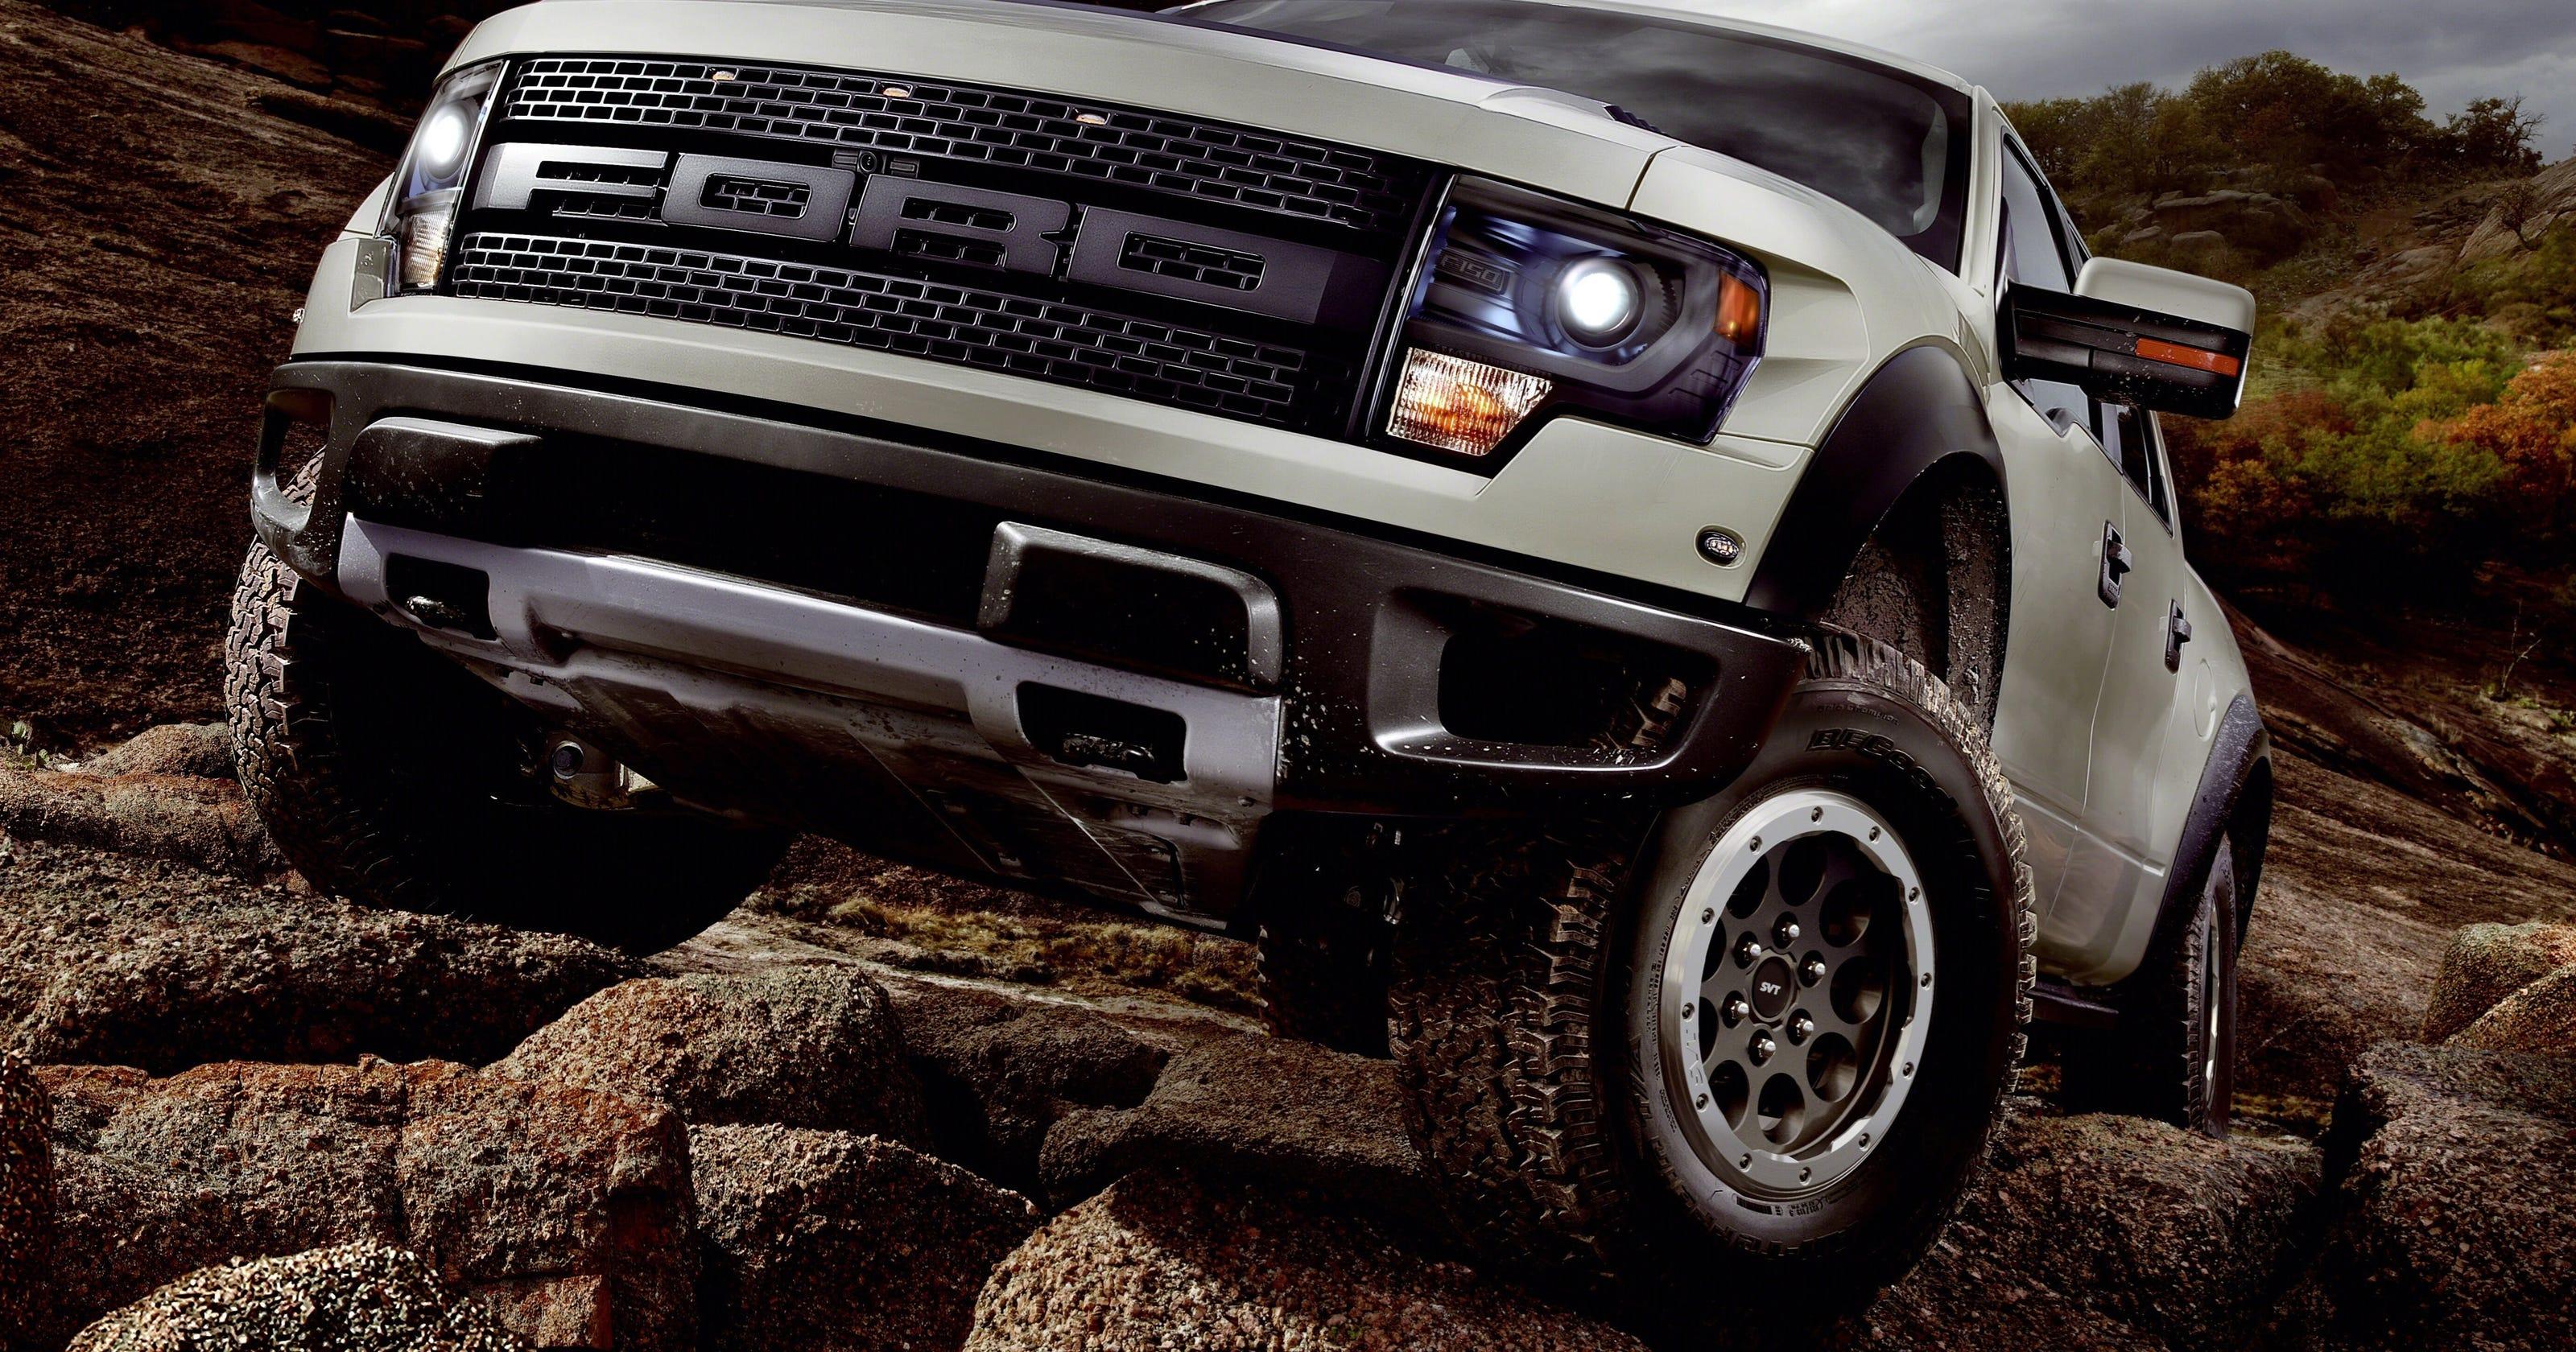 truck tag line 39 built ford tough 39 turns 35. Black Bedroom Furniture Sets. Home Design Ideas